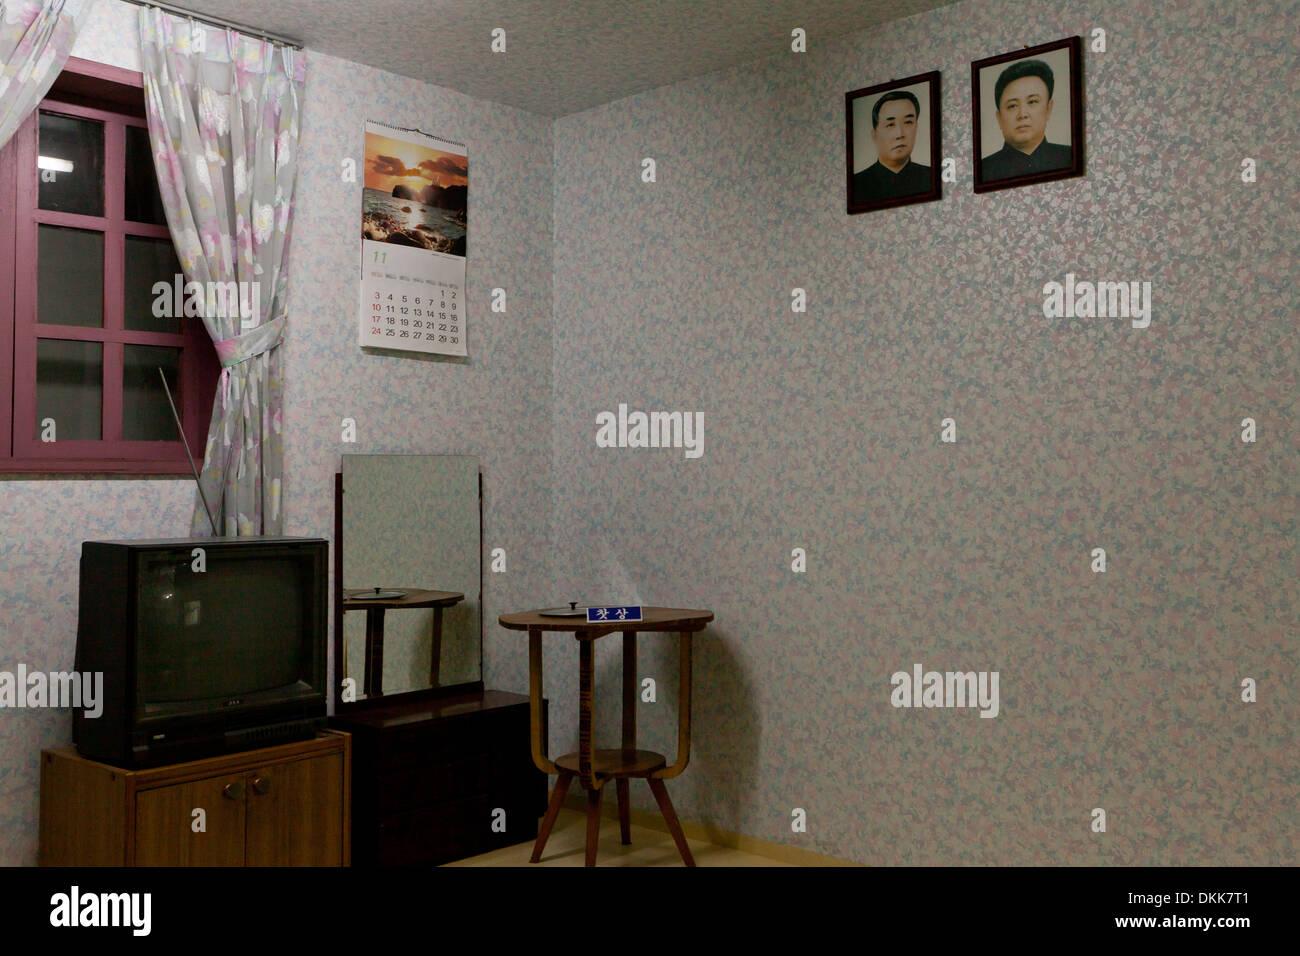 Mock-up of North Korean family home interior displaying portraits of Kim Il Song and Kim Jong Il on wall - Stock Image